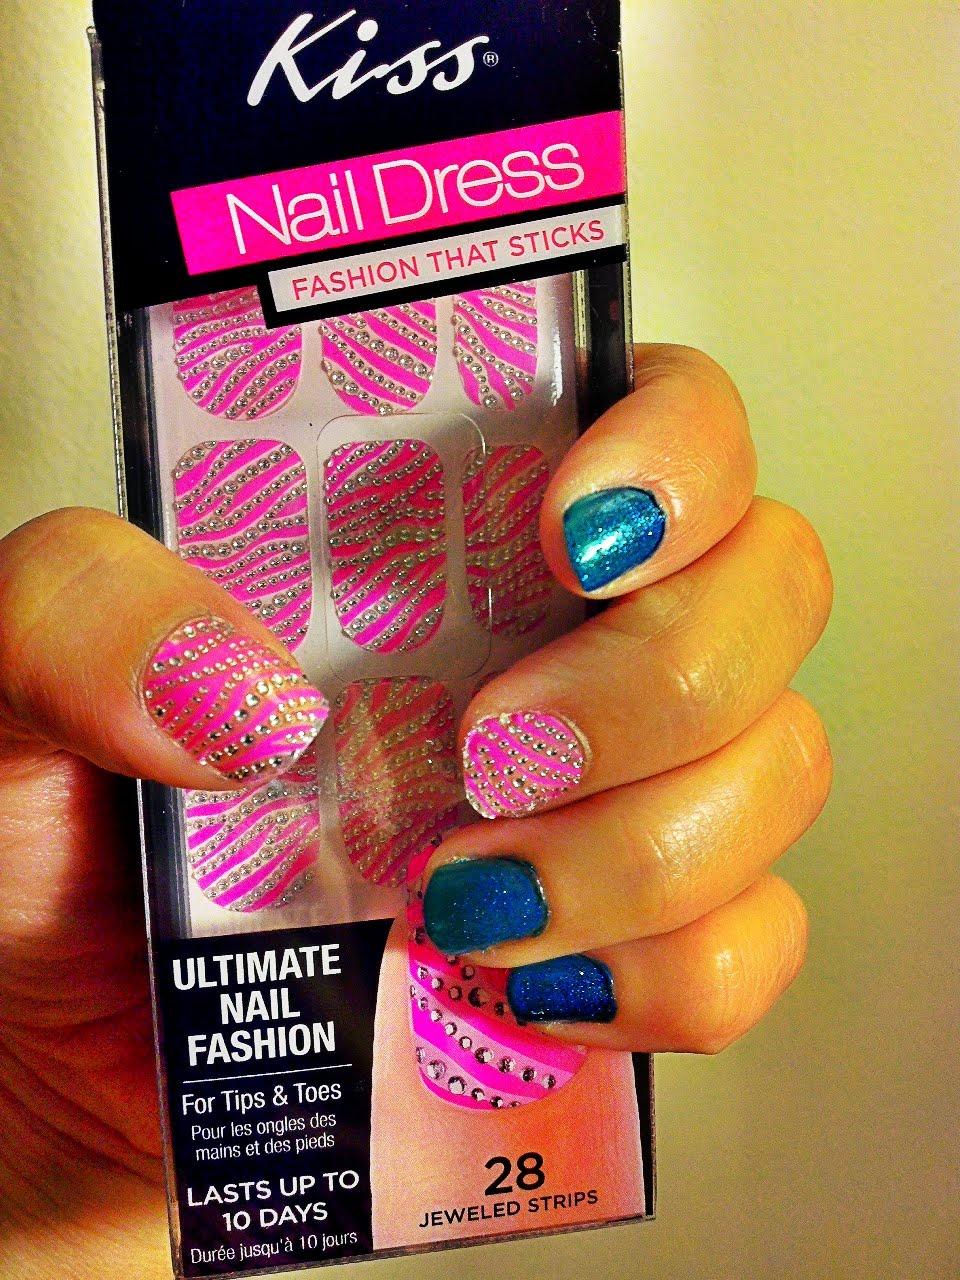 Daily Dose of Fashion and Beauty: Kiss Nail Dress